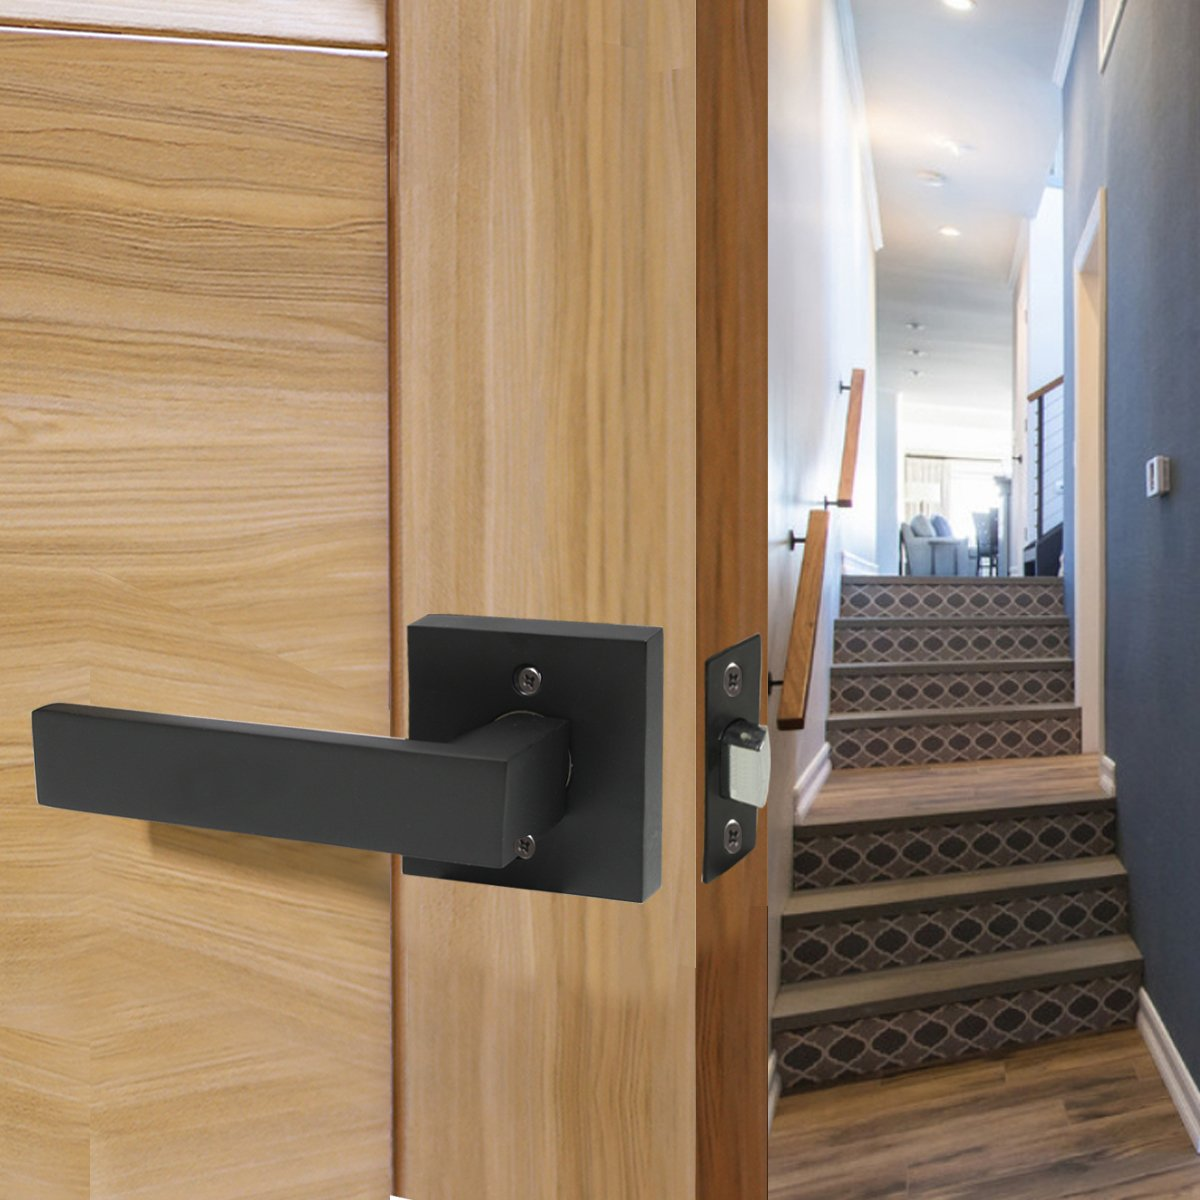 5 Pack Probrico Square Door Lever Door Lock Handle Lockset Keyless Doorknobs Passage Knobs Lockset Interior Hallway Passage Closet DL01-BK-PS in Black by Probrico (Image #8)